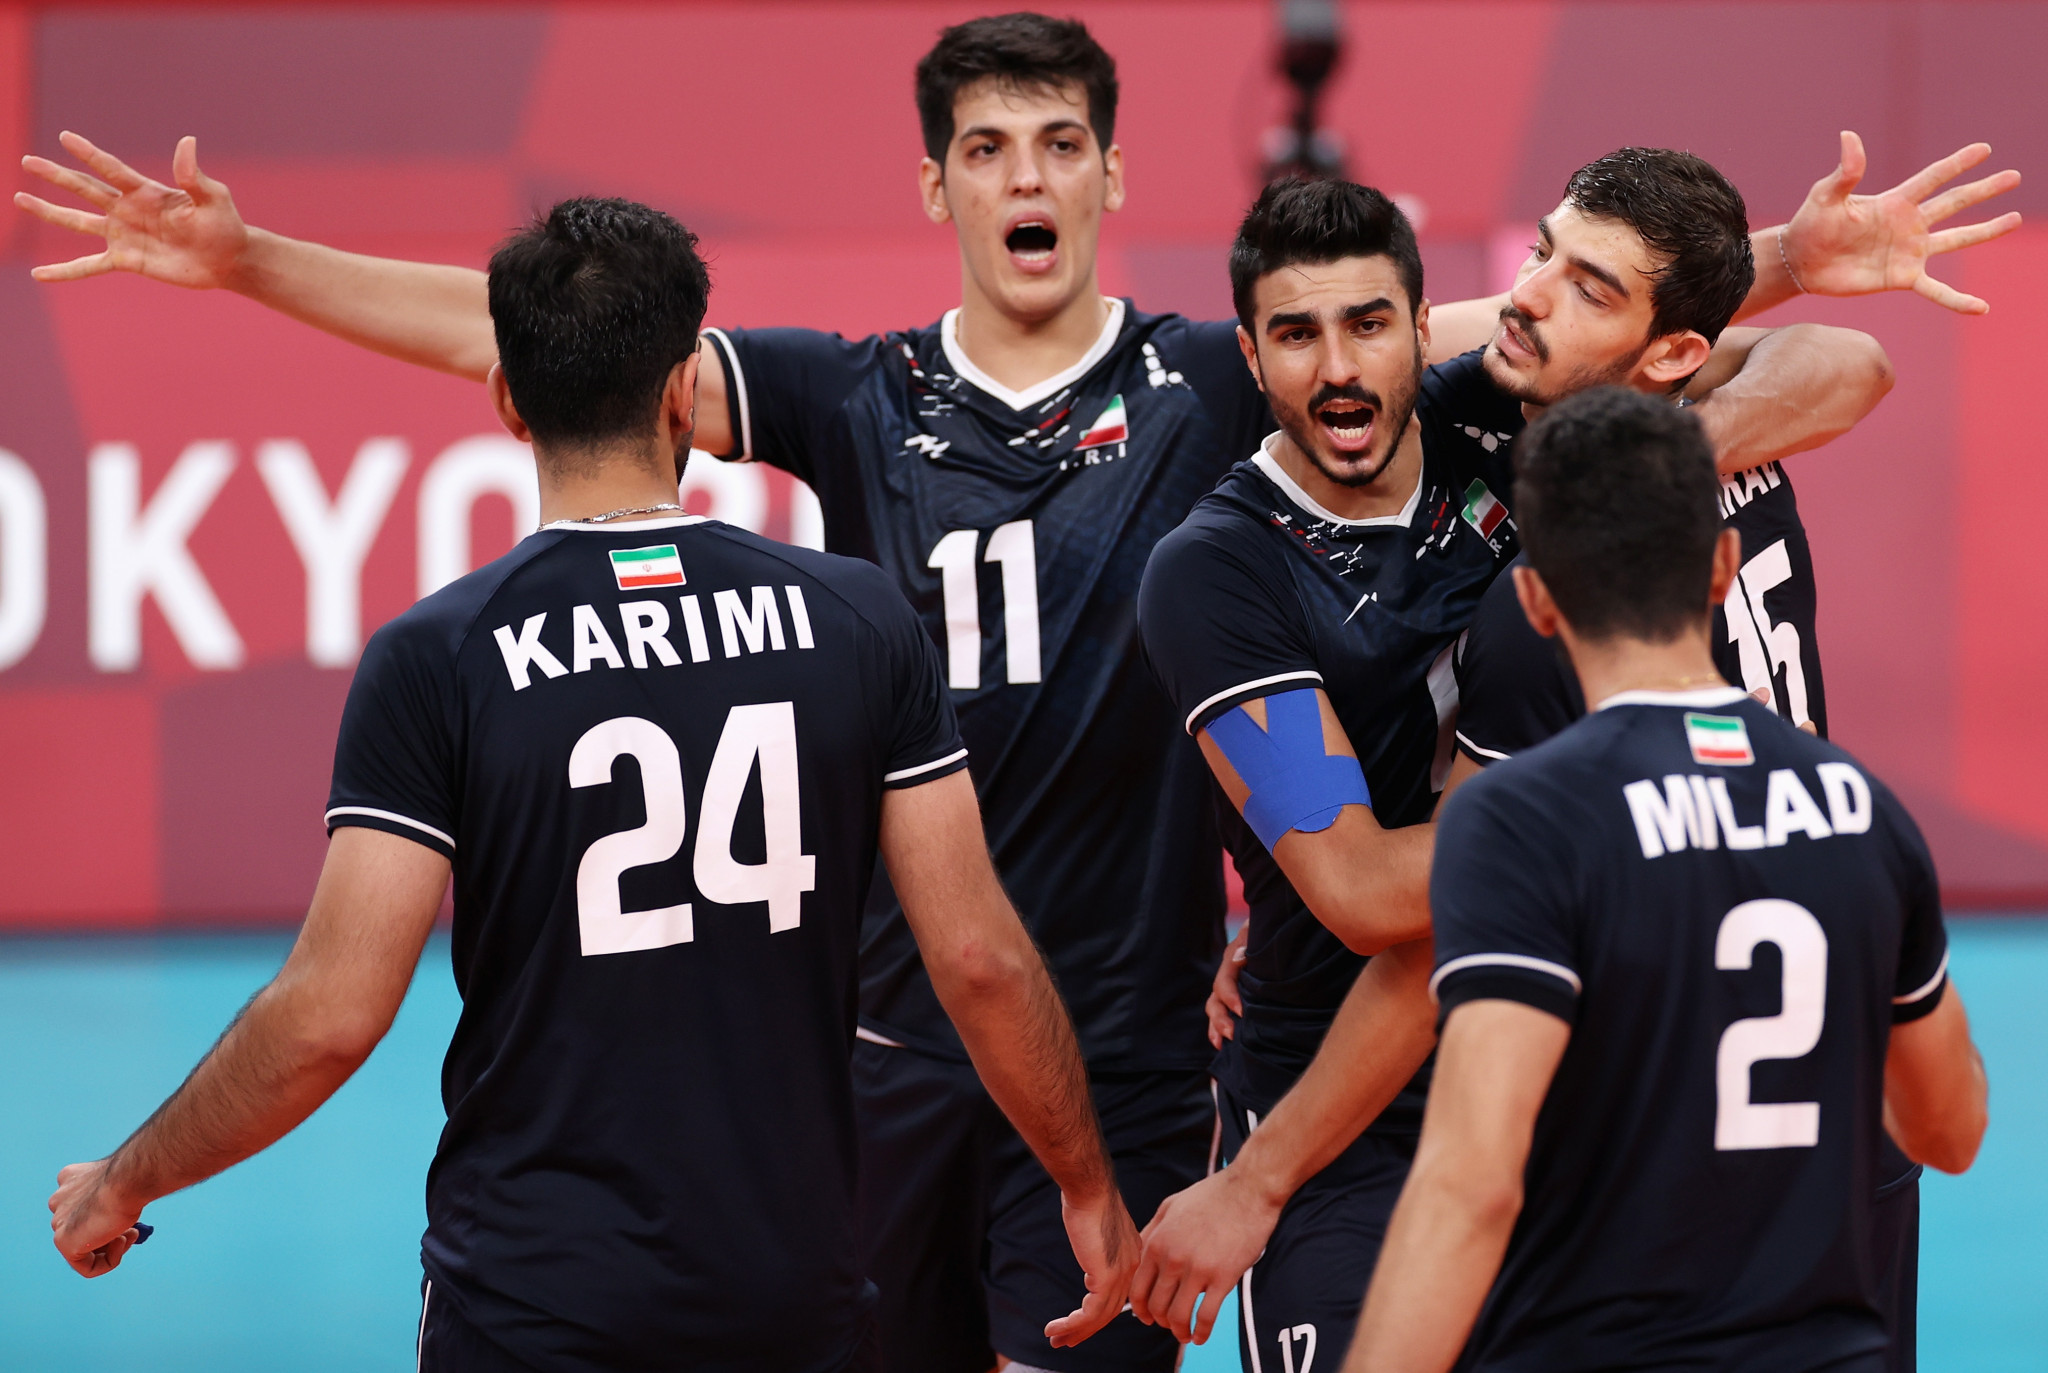 Hosts Japan among semi-finalists at Asian Men's Volleyball Championship